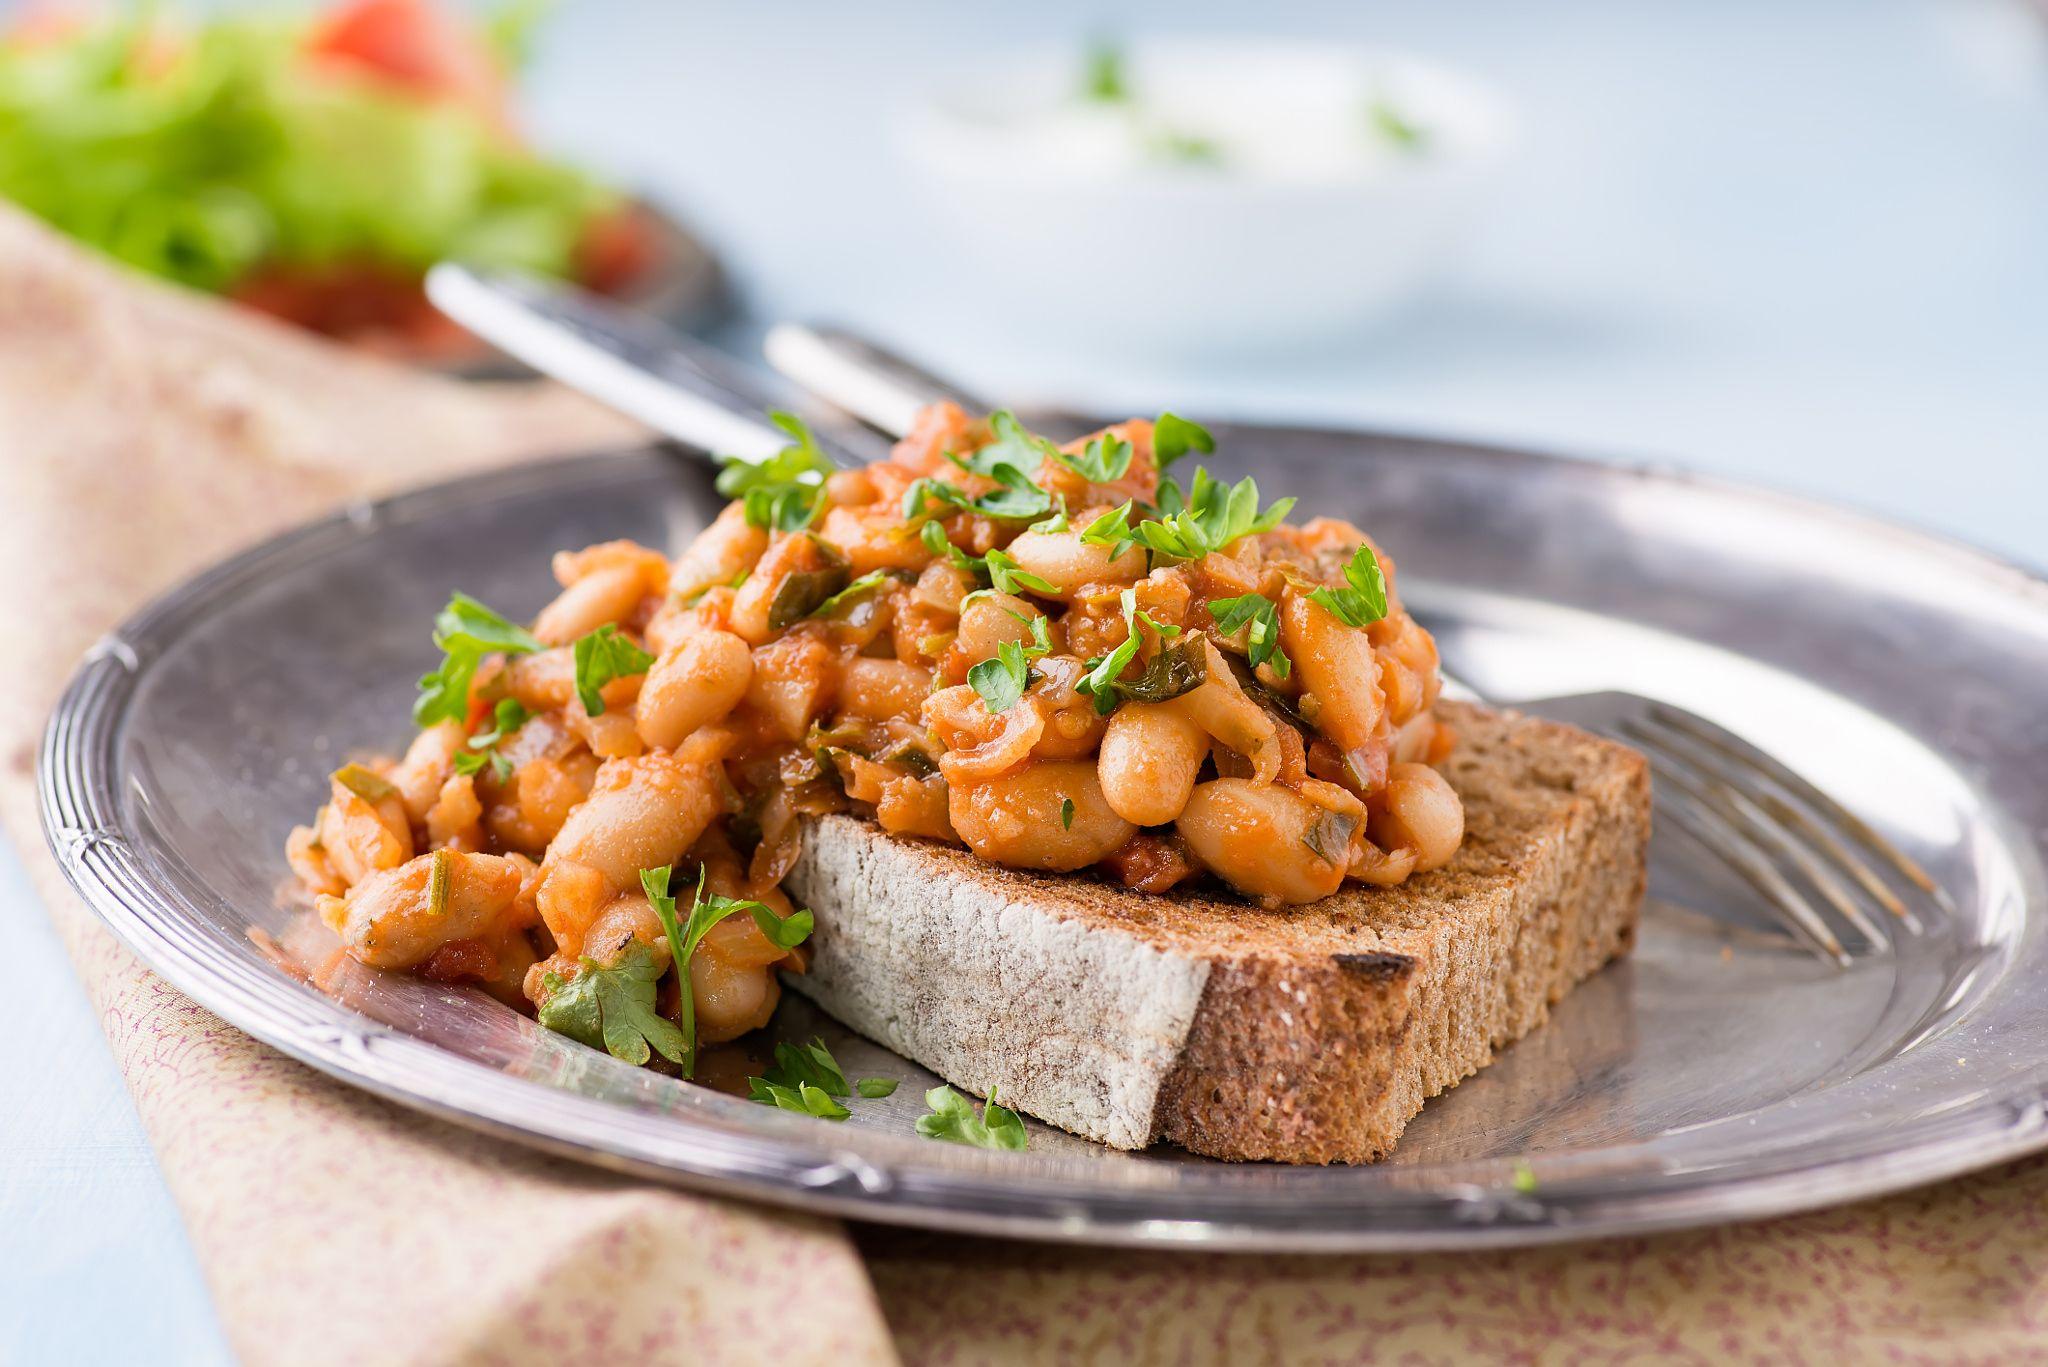 katia white Stewed white beans in tomato sauce on toasted bread - Stewed white beans in tomato sauce on toasted bread, selective focus, closeup